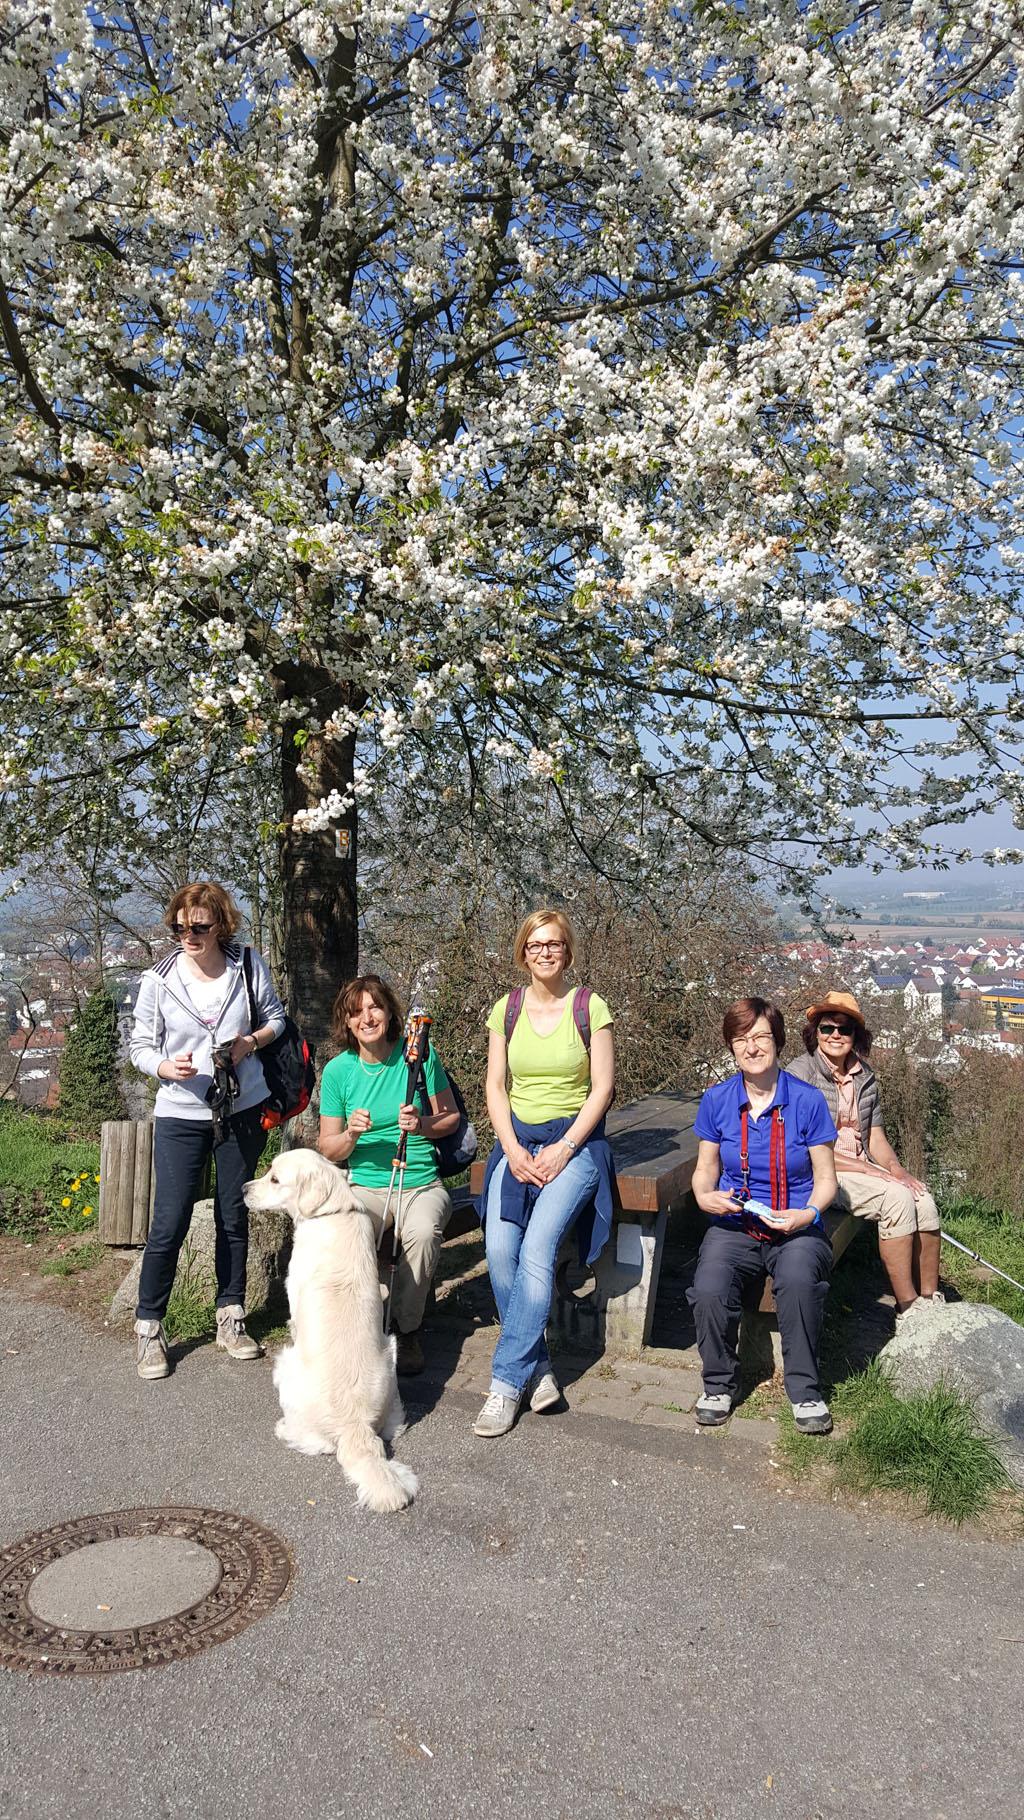 Wandern - 9 April